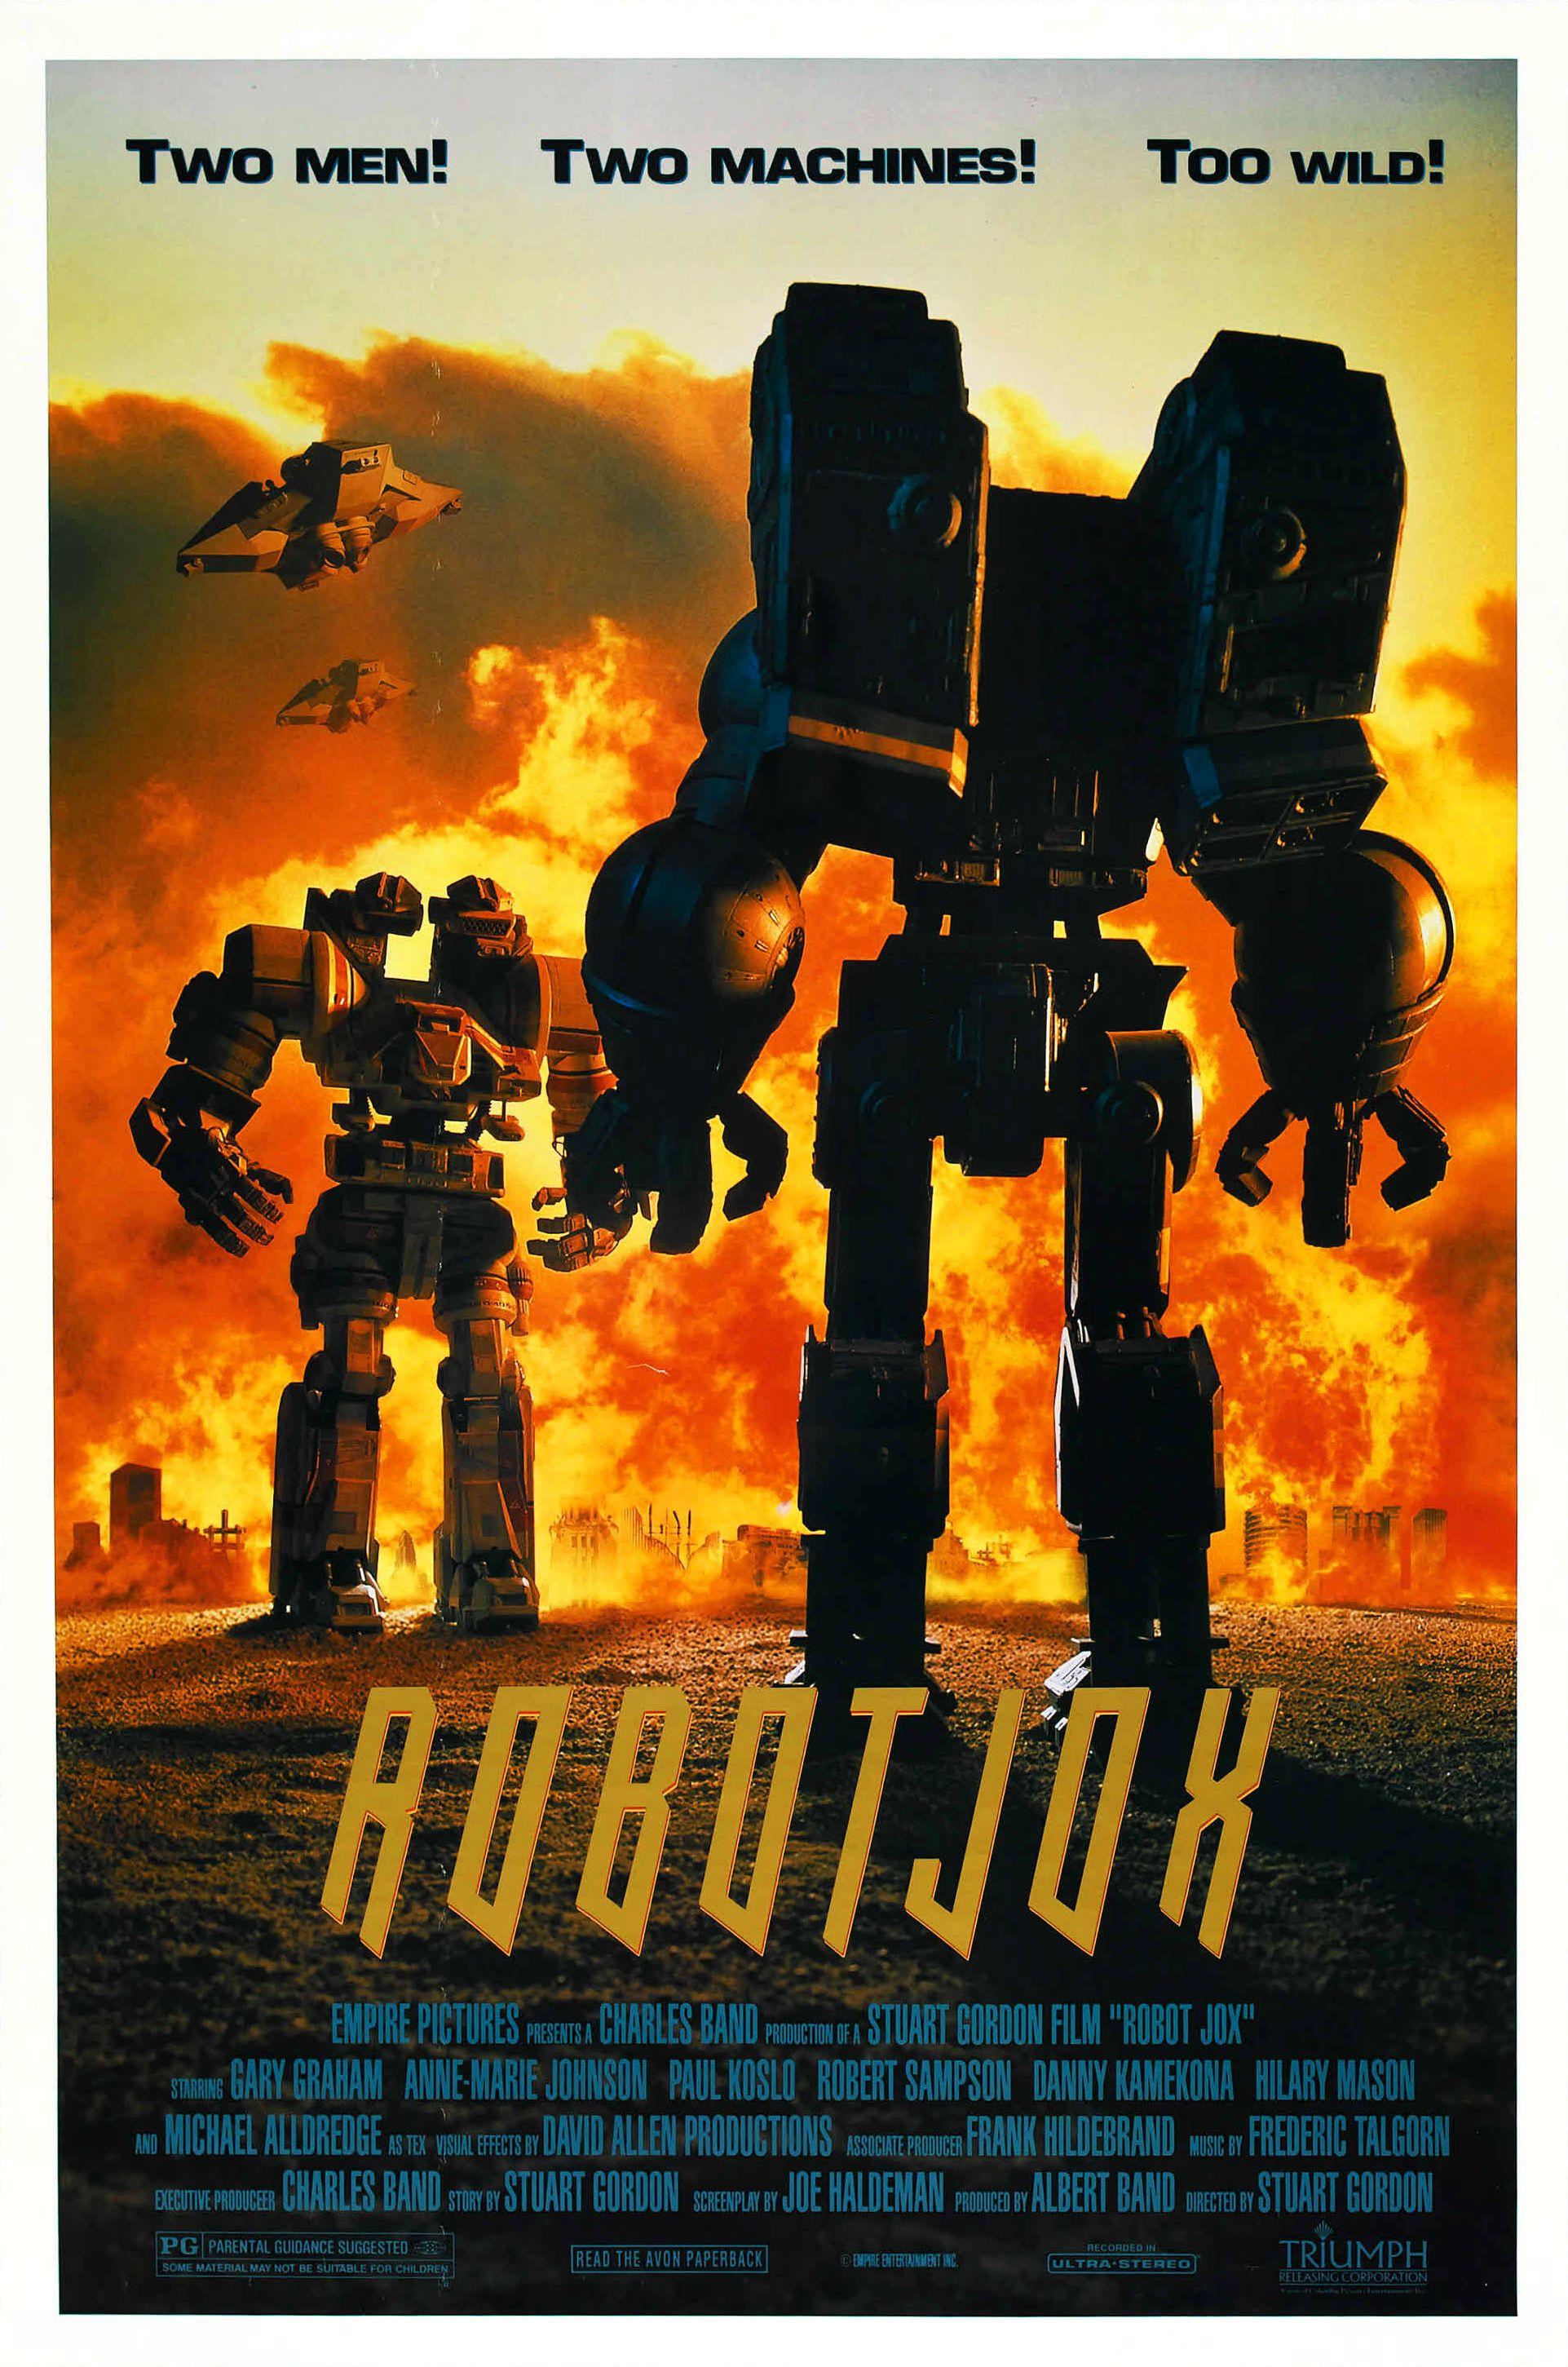 robot_jox_poster_1990_02.jpg